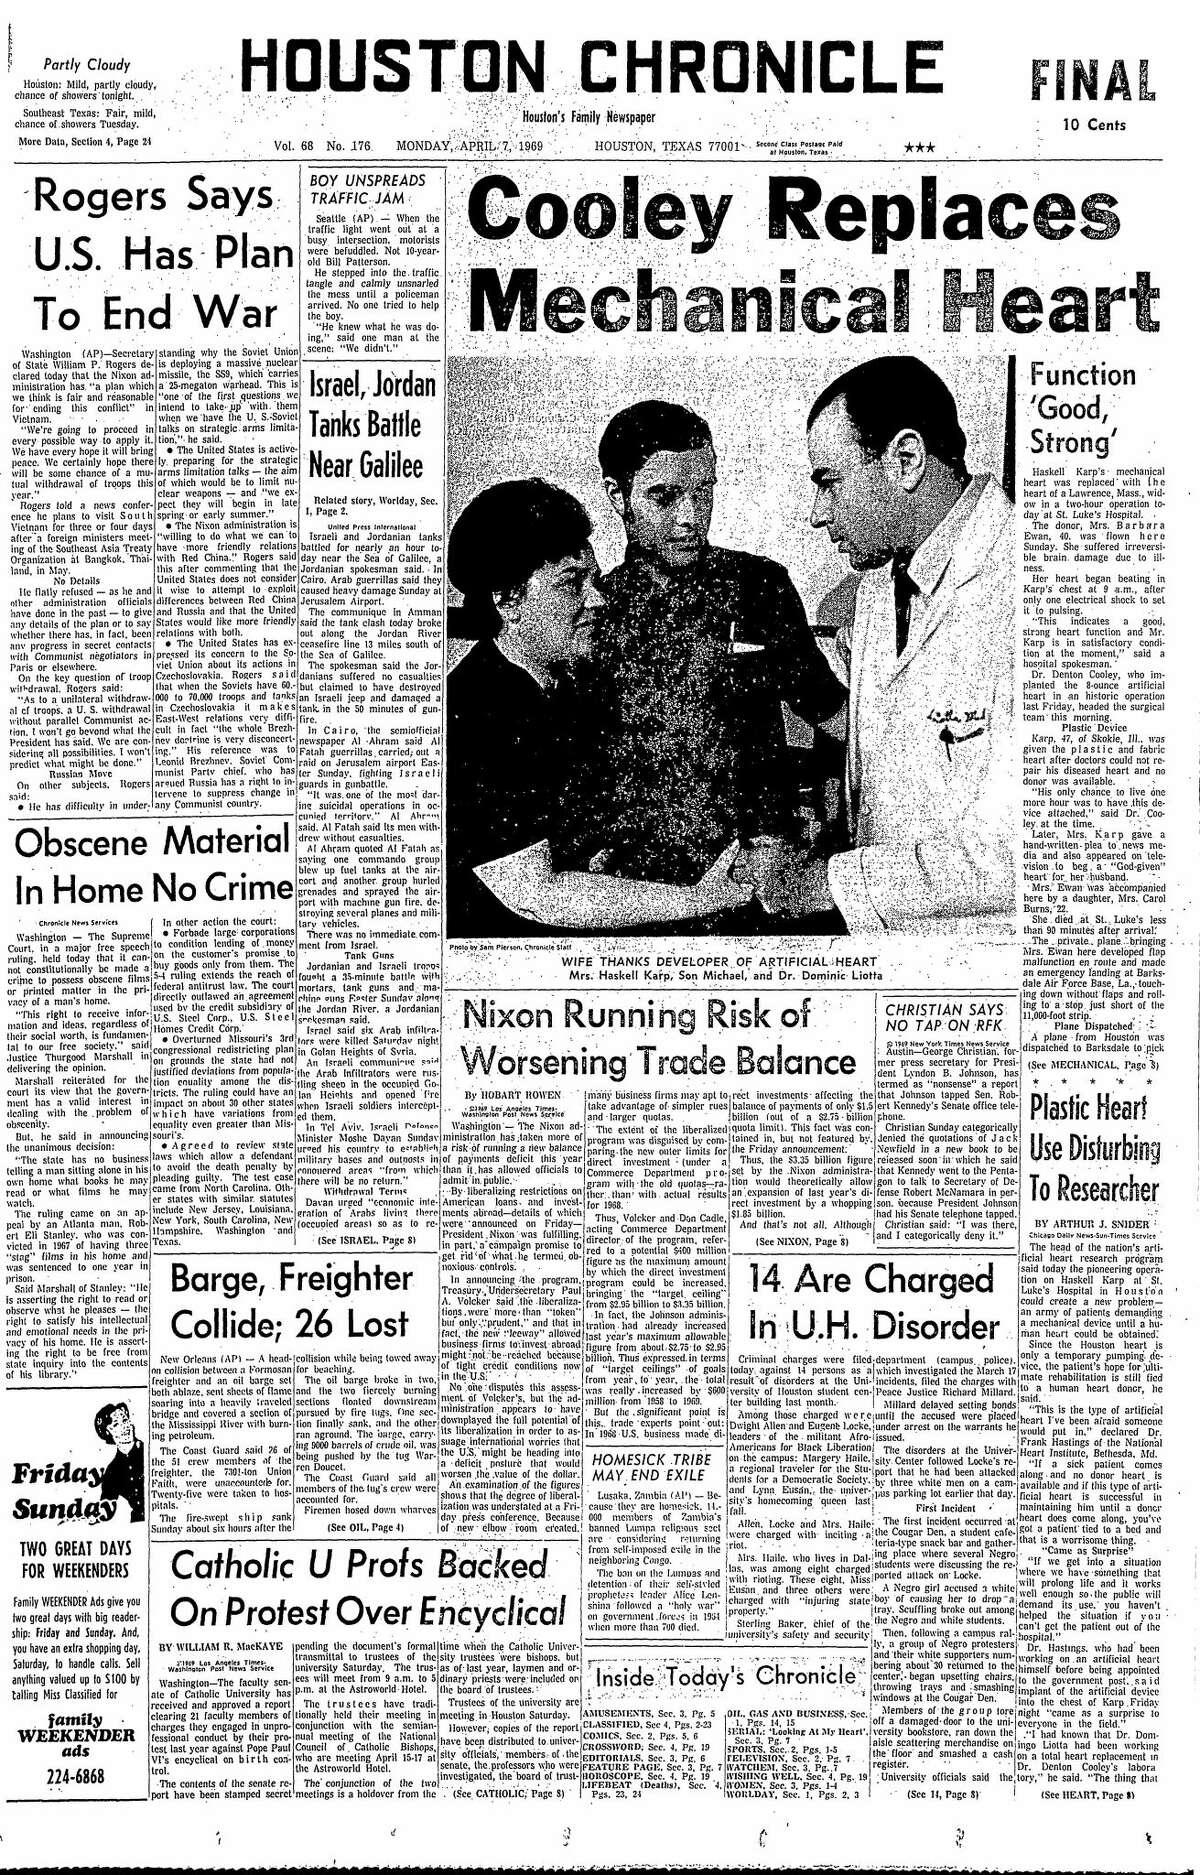 April 7, 1969